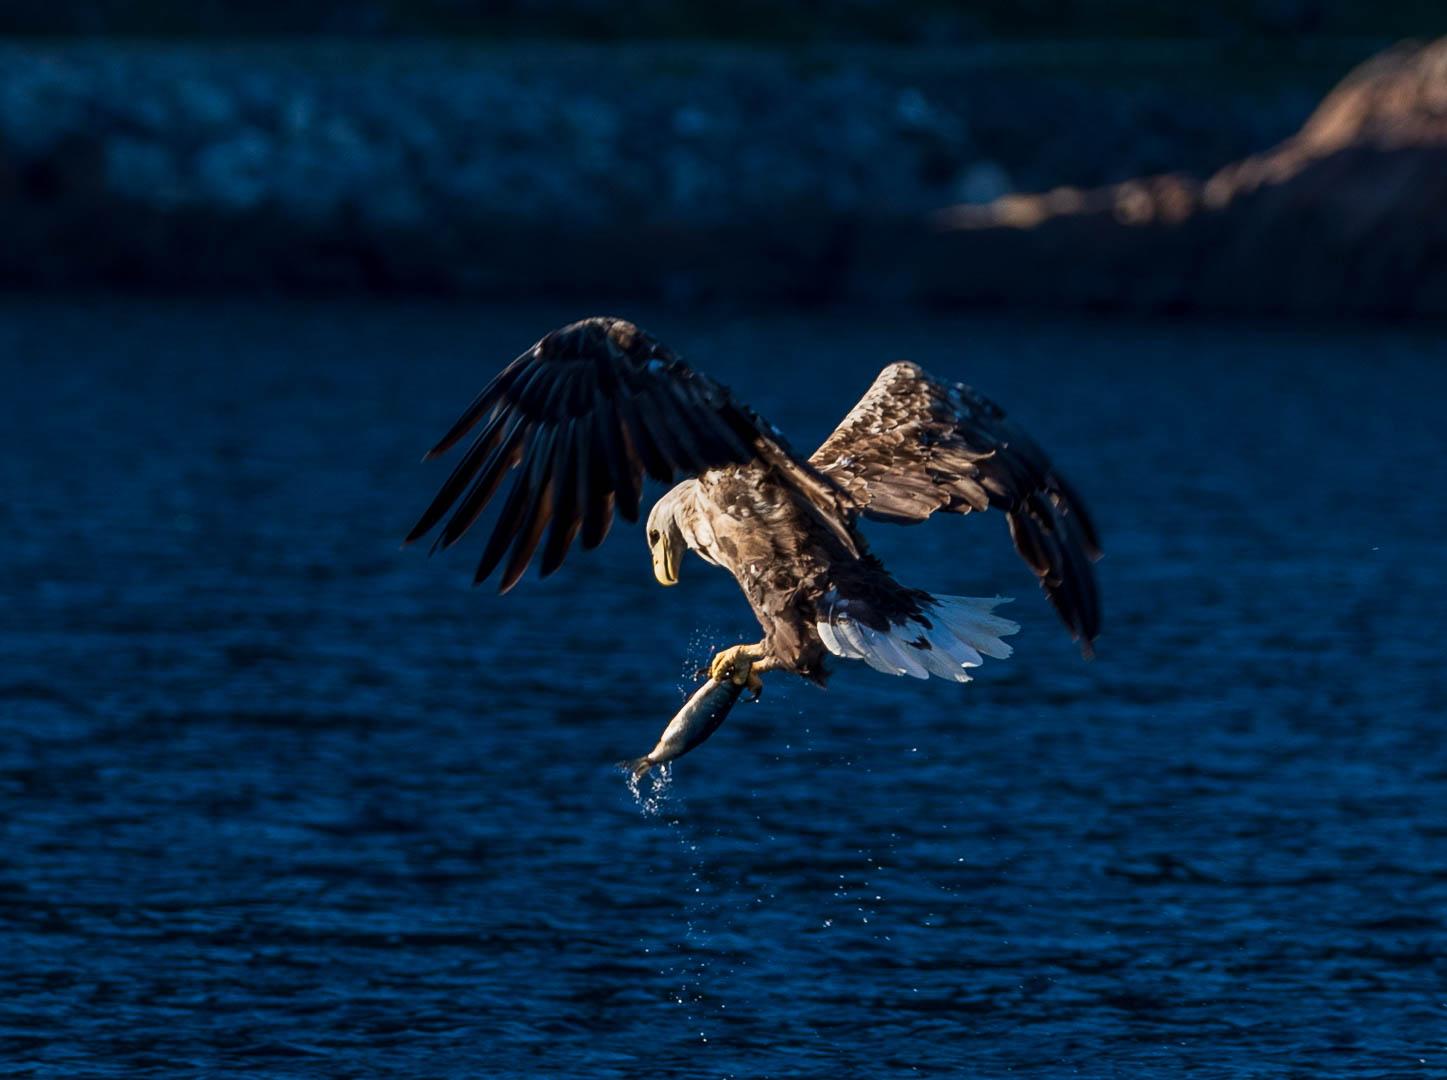 Eagle safari in Lofoten